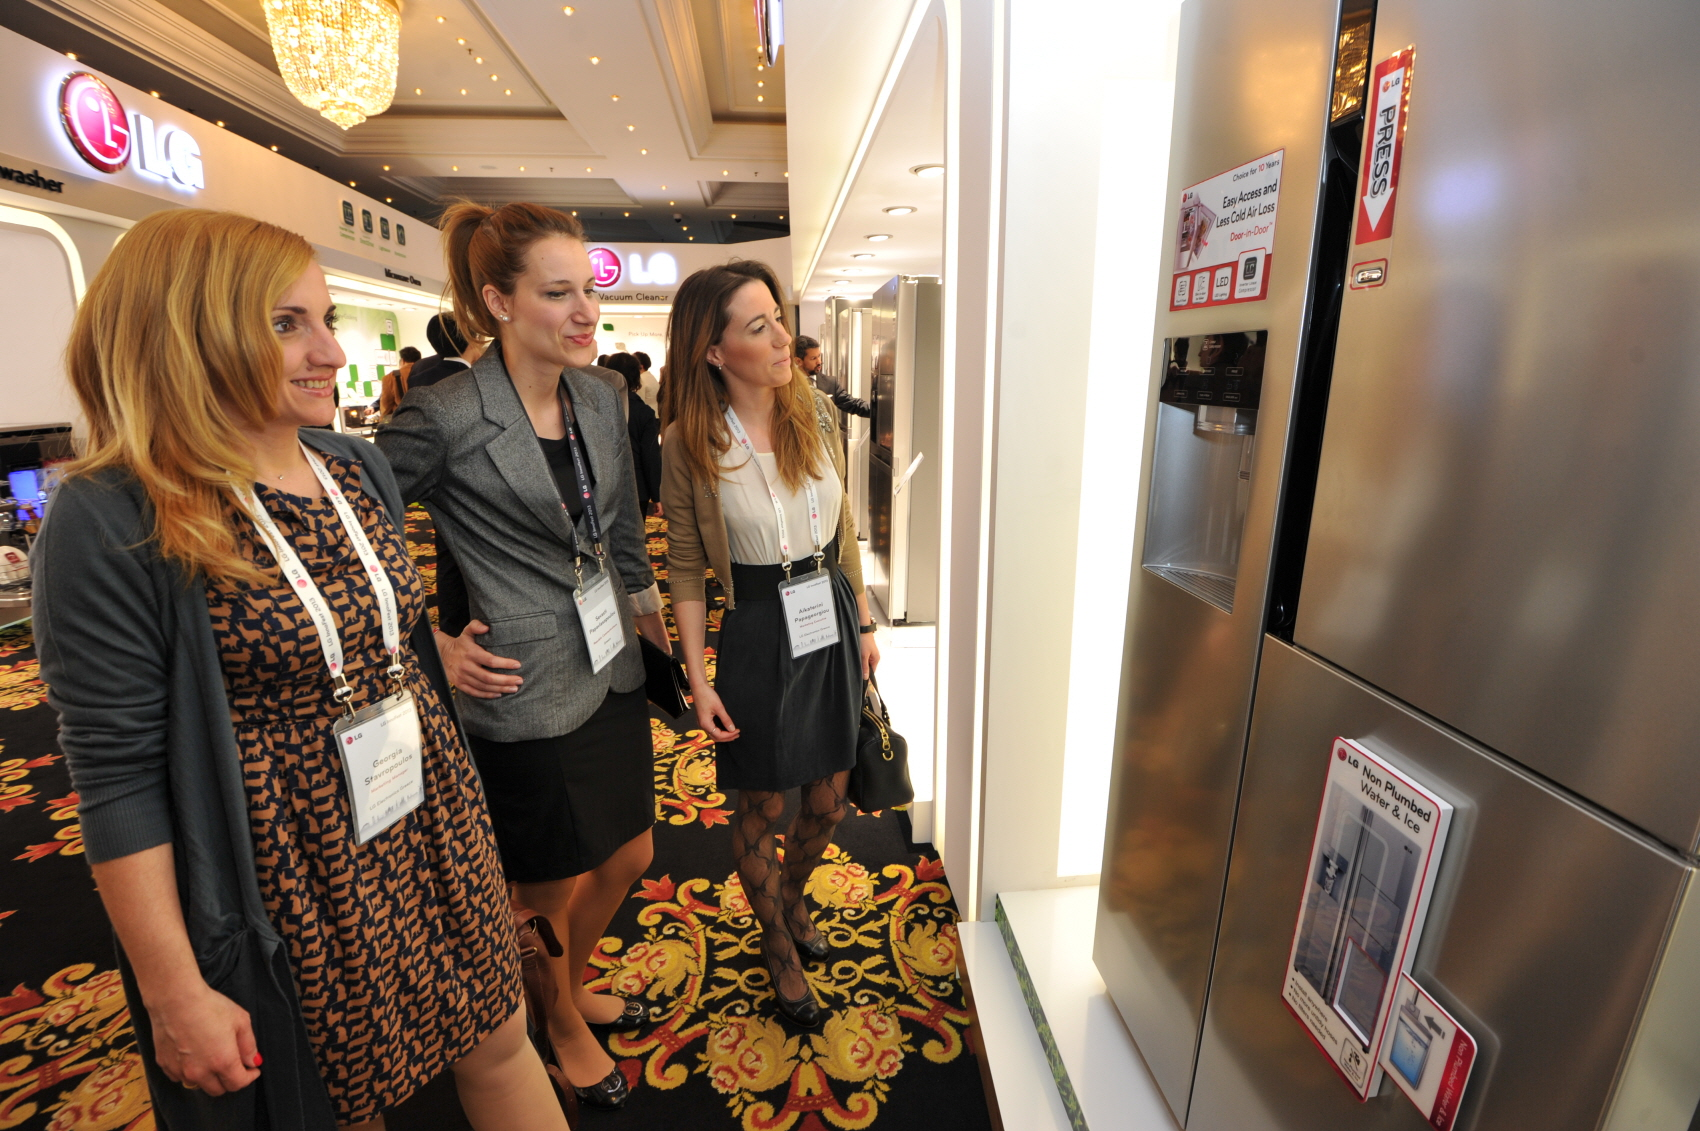 Three visitors observe an LG refrigerator with the Door-in-Door feature